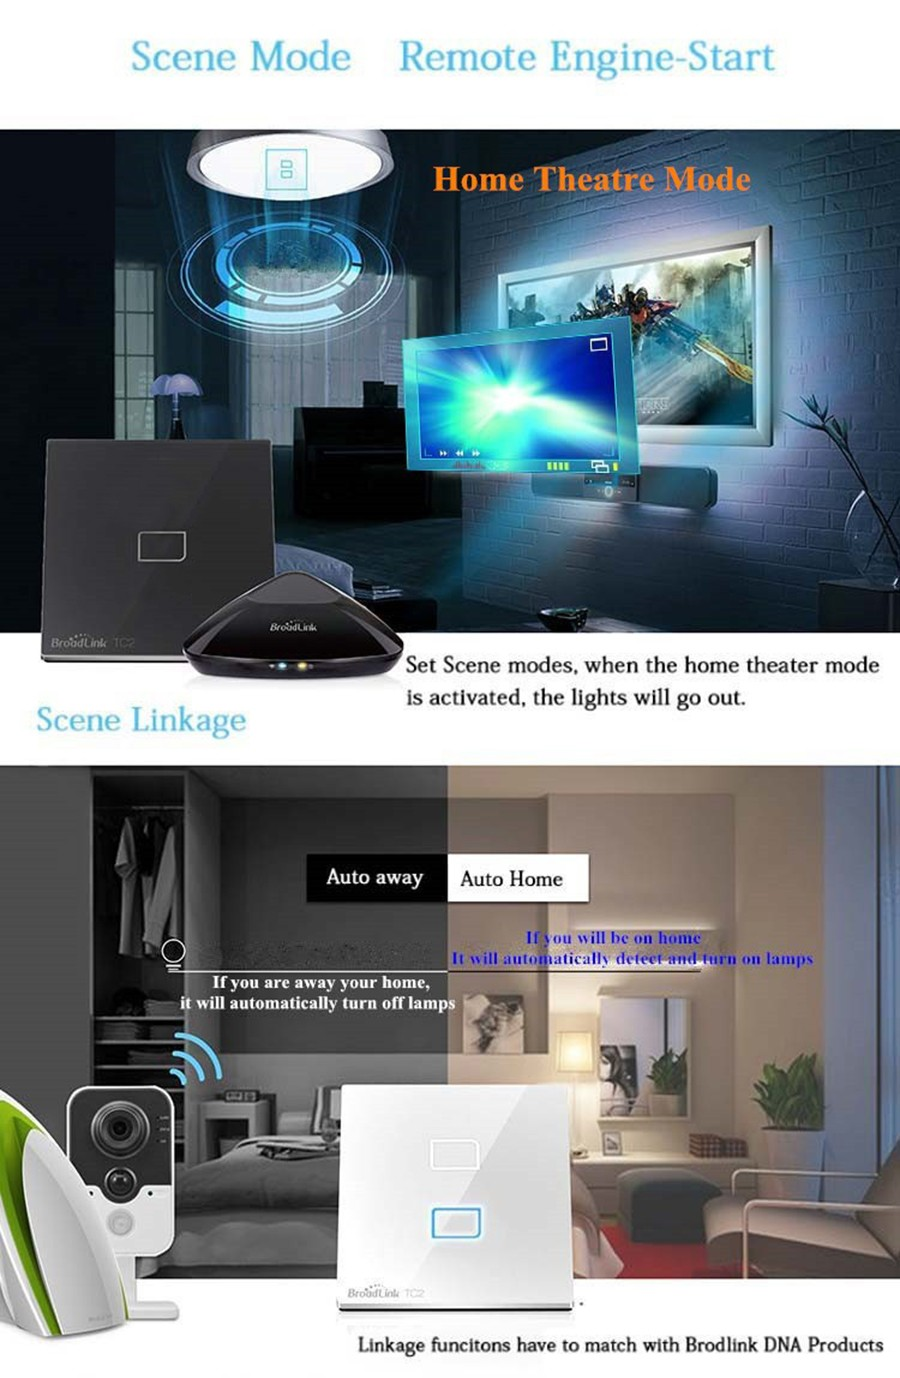 Broadlink TC2 בריטניה אלחוטית 1כנופיית קיר מתג חכם מגע מתג Wifi Remote Control מתג חכם, אוטומציה ביתית 110-240V